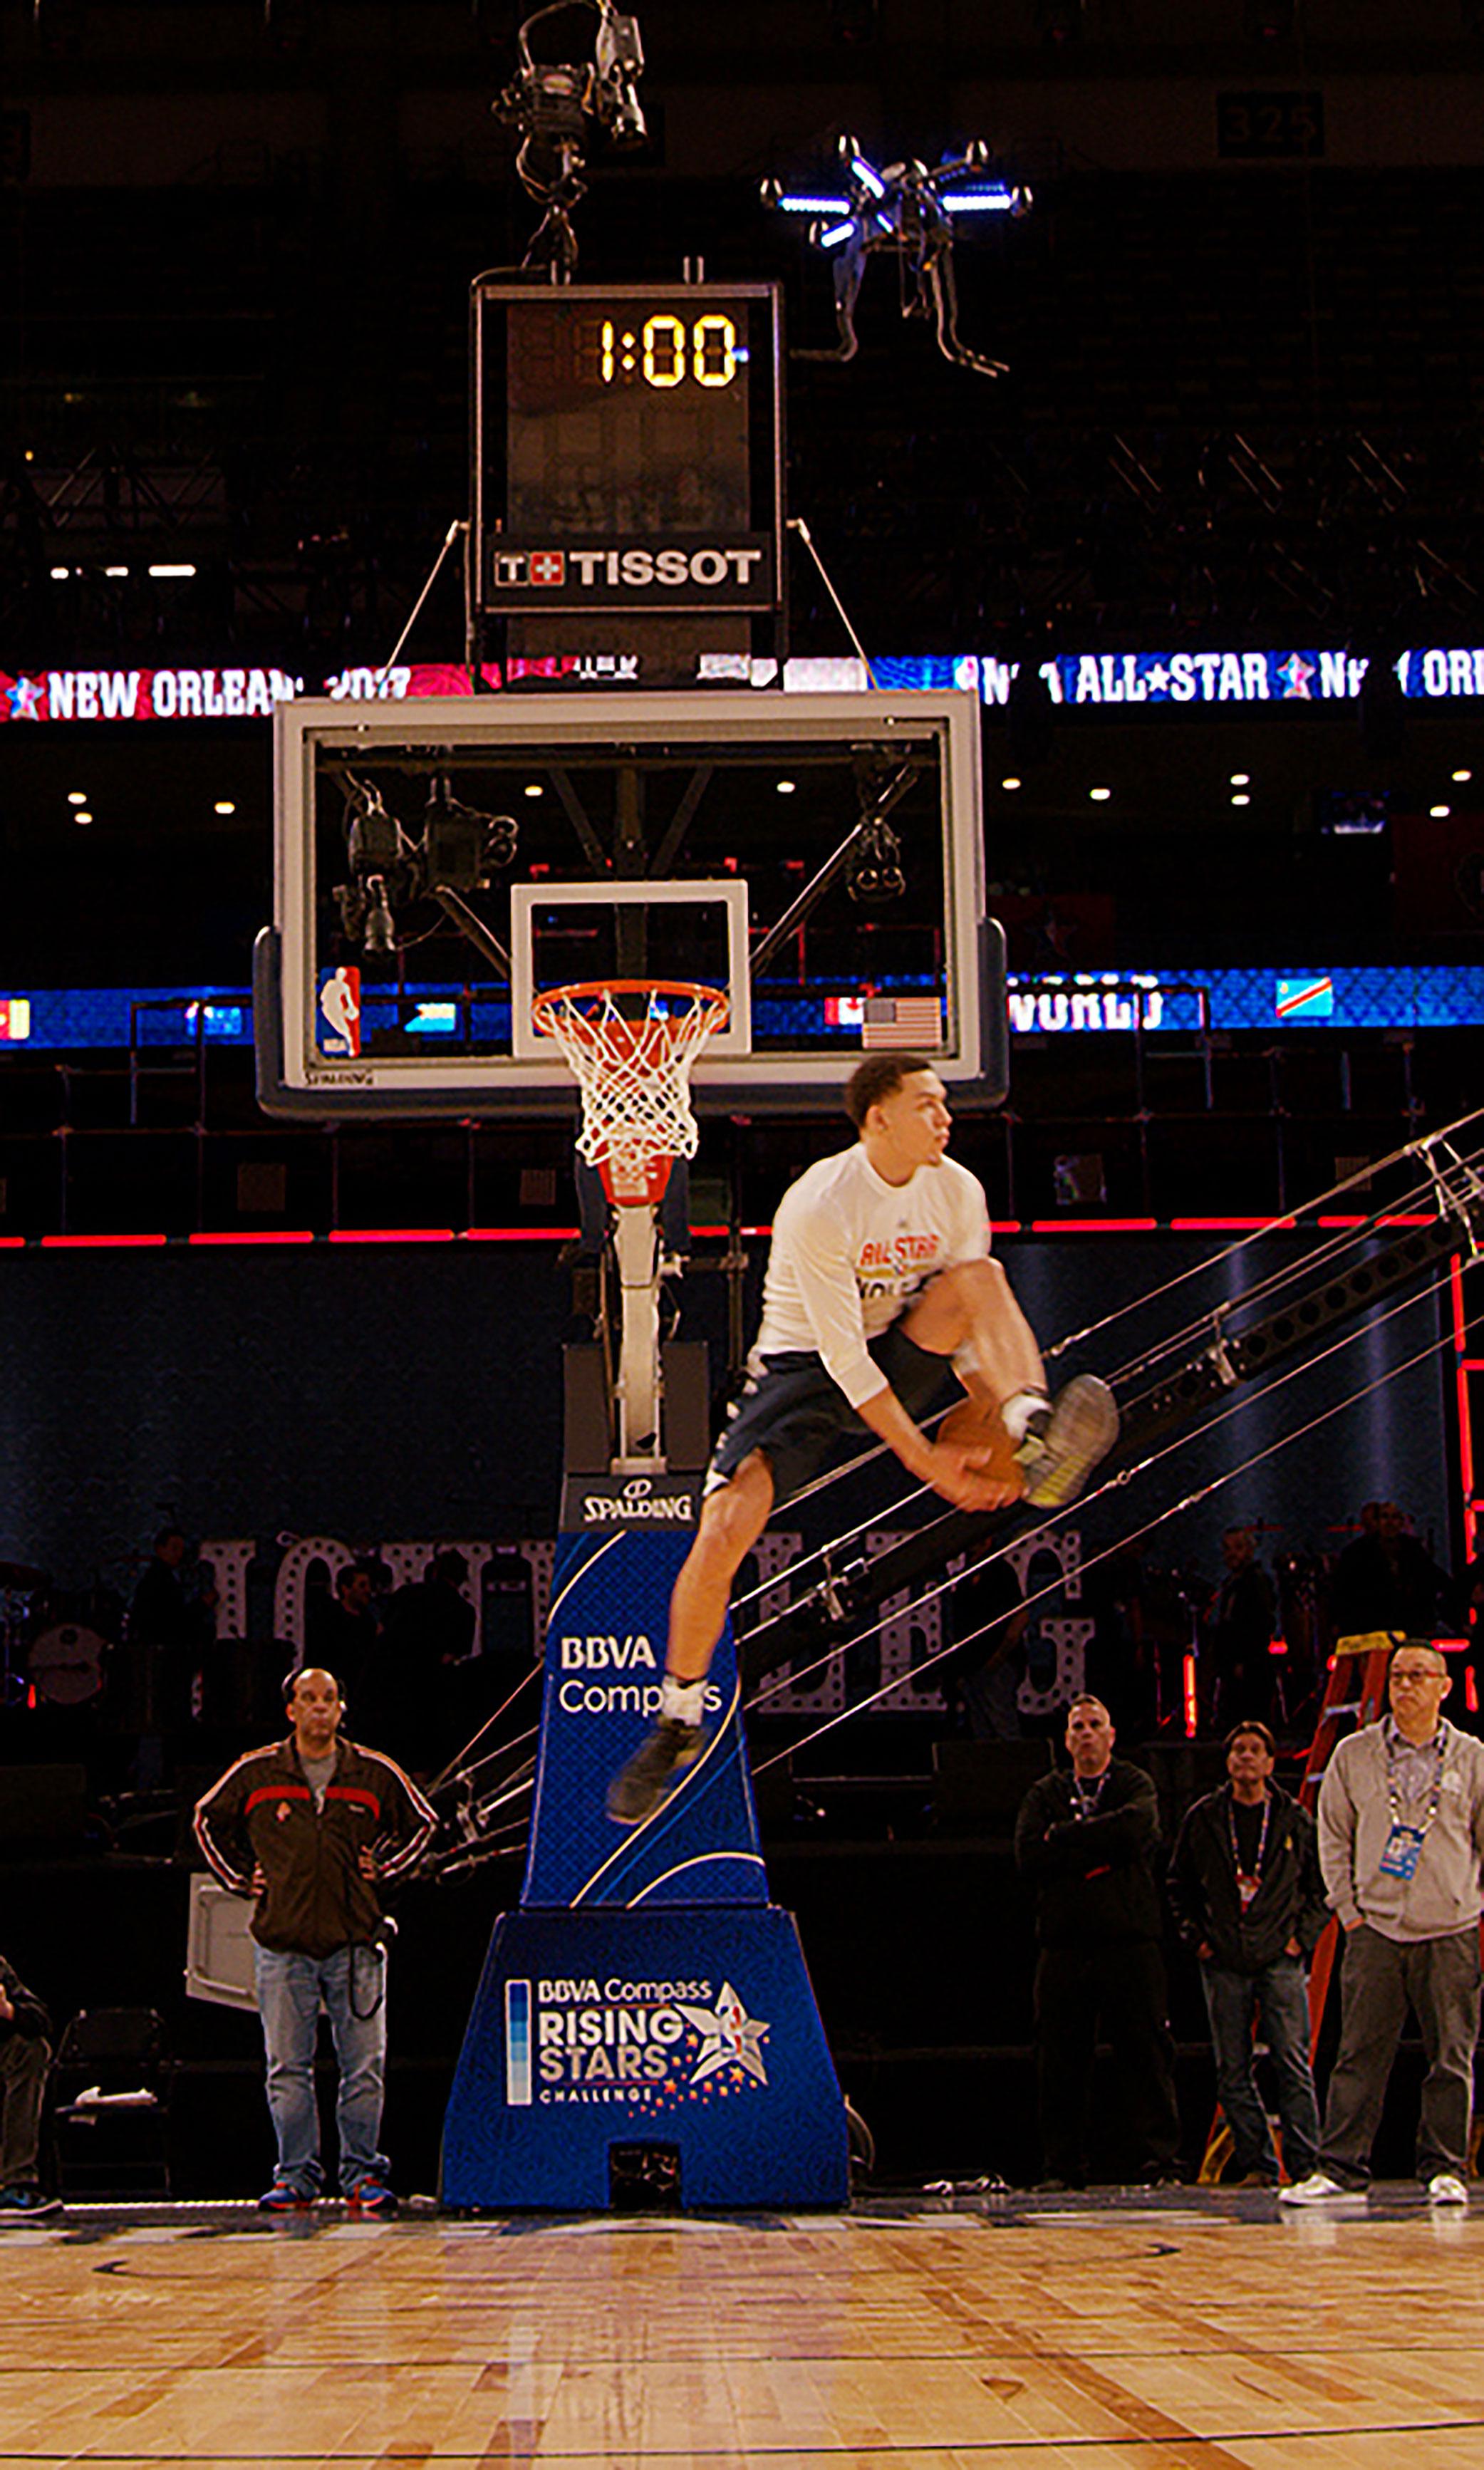 NBA Forward Aaron Gordon Practices With An Intel Drone Ahead Of The 2017 Verizon Slam